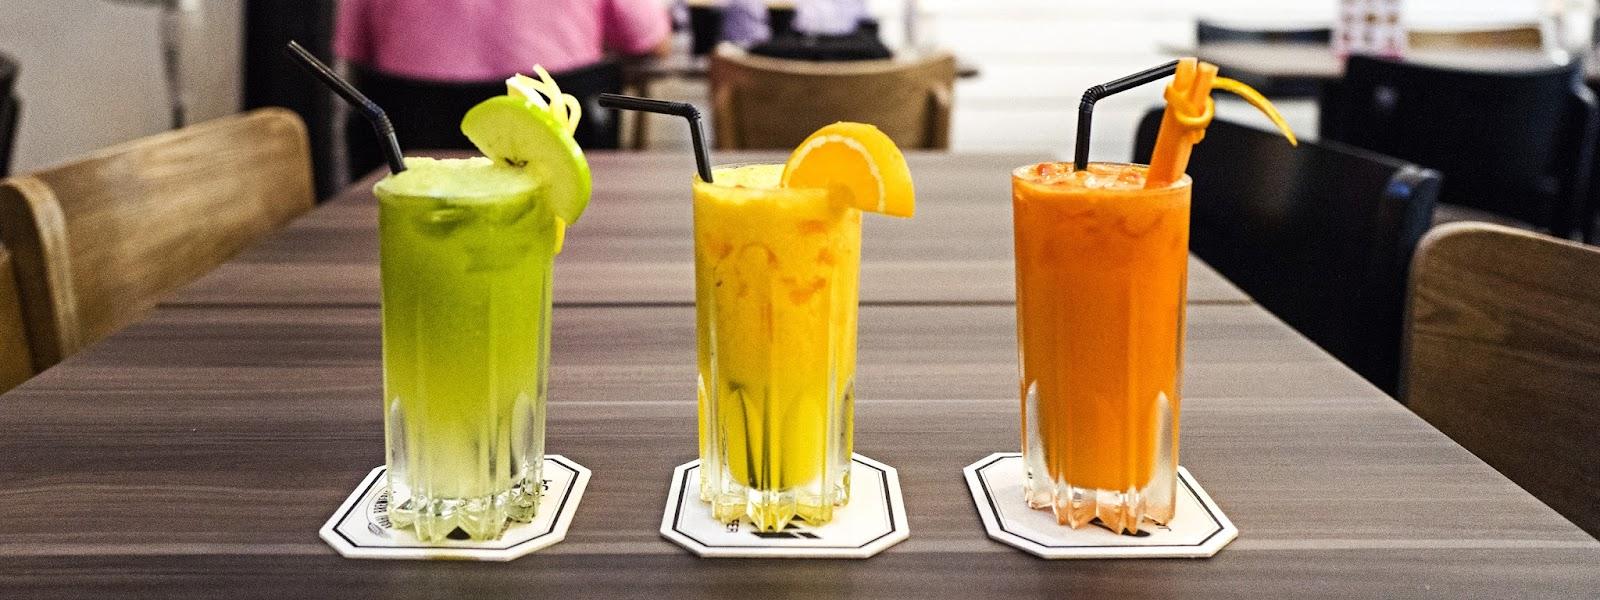 f-juices-L1050655.jpg